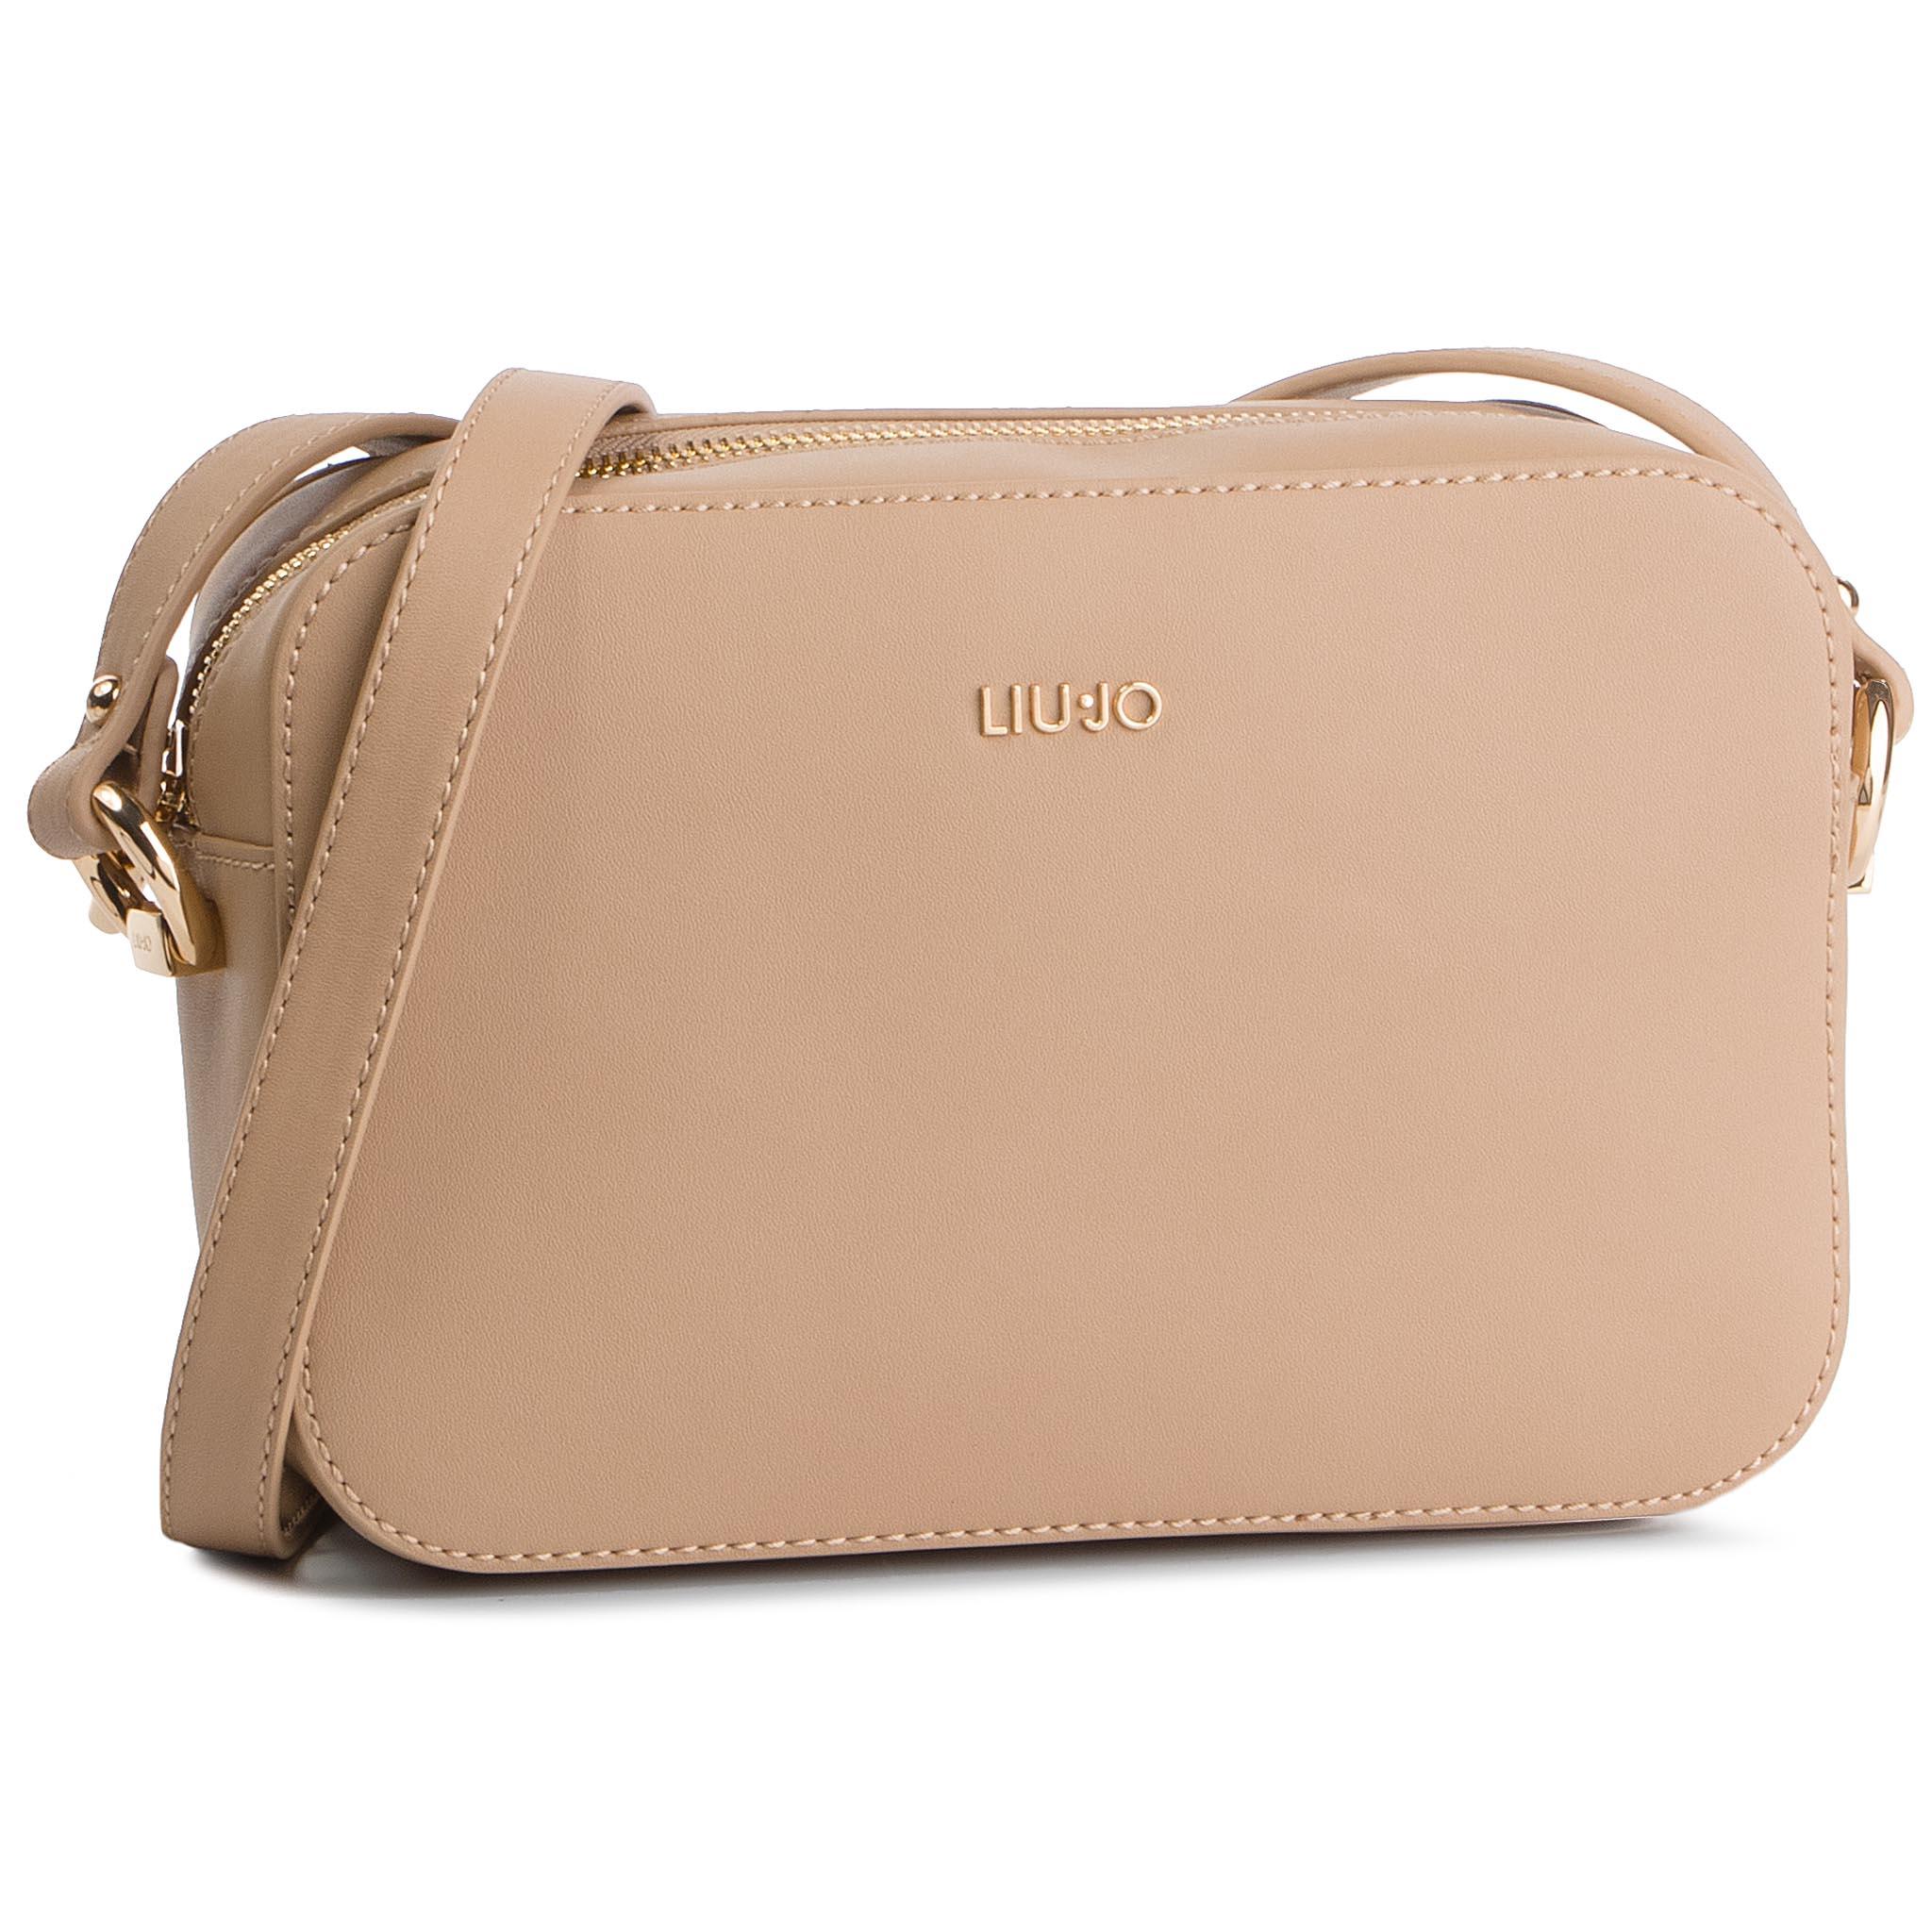 9ed87a9b23 Handbag LIU JO - Xs Crossbody N19092 E0040 Wasabi 75923 - Cross Body ...